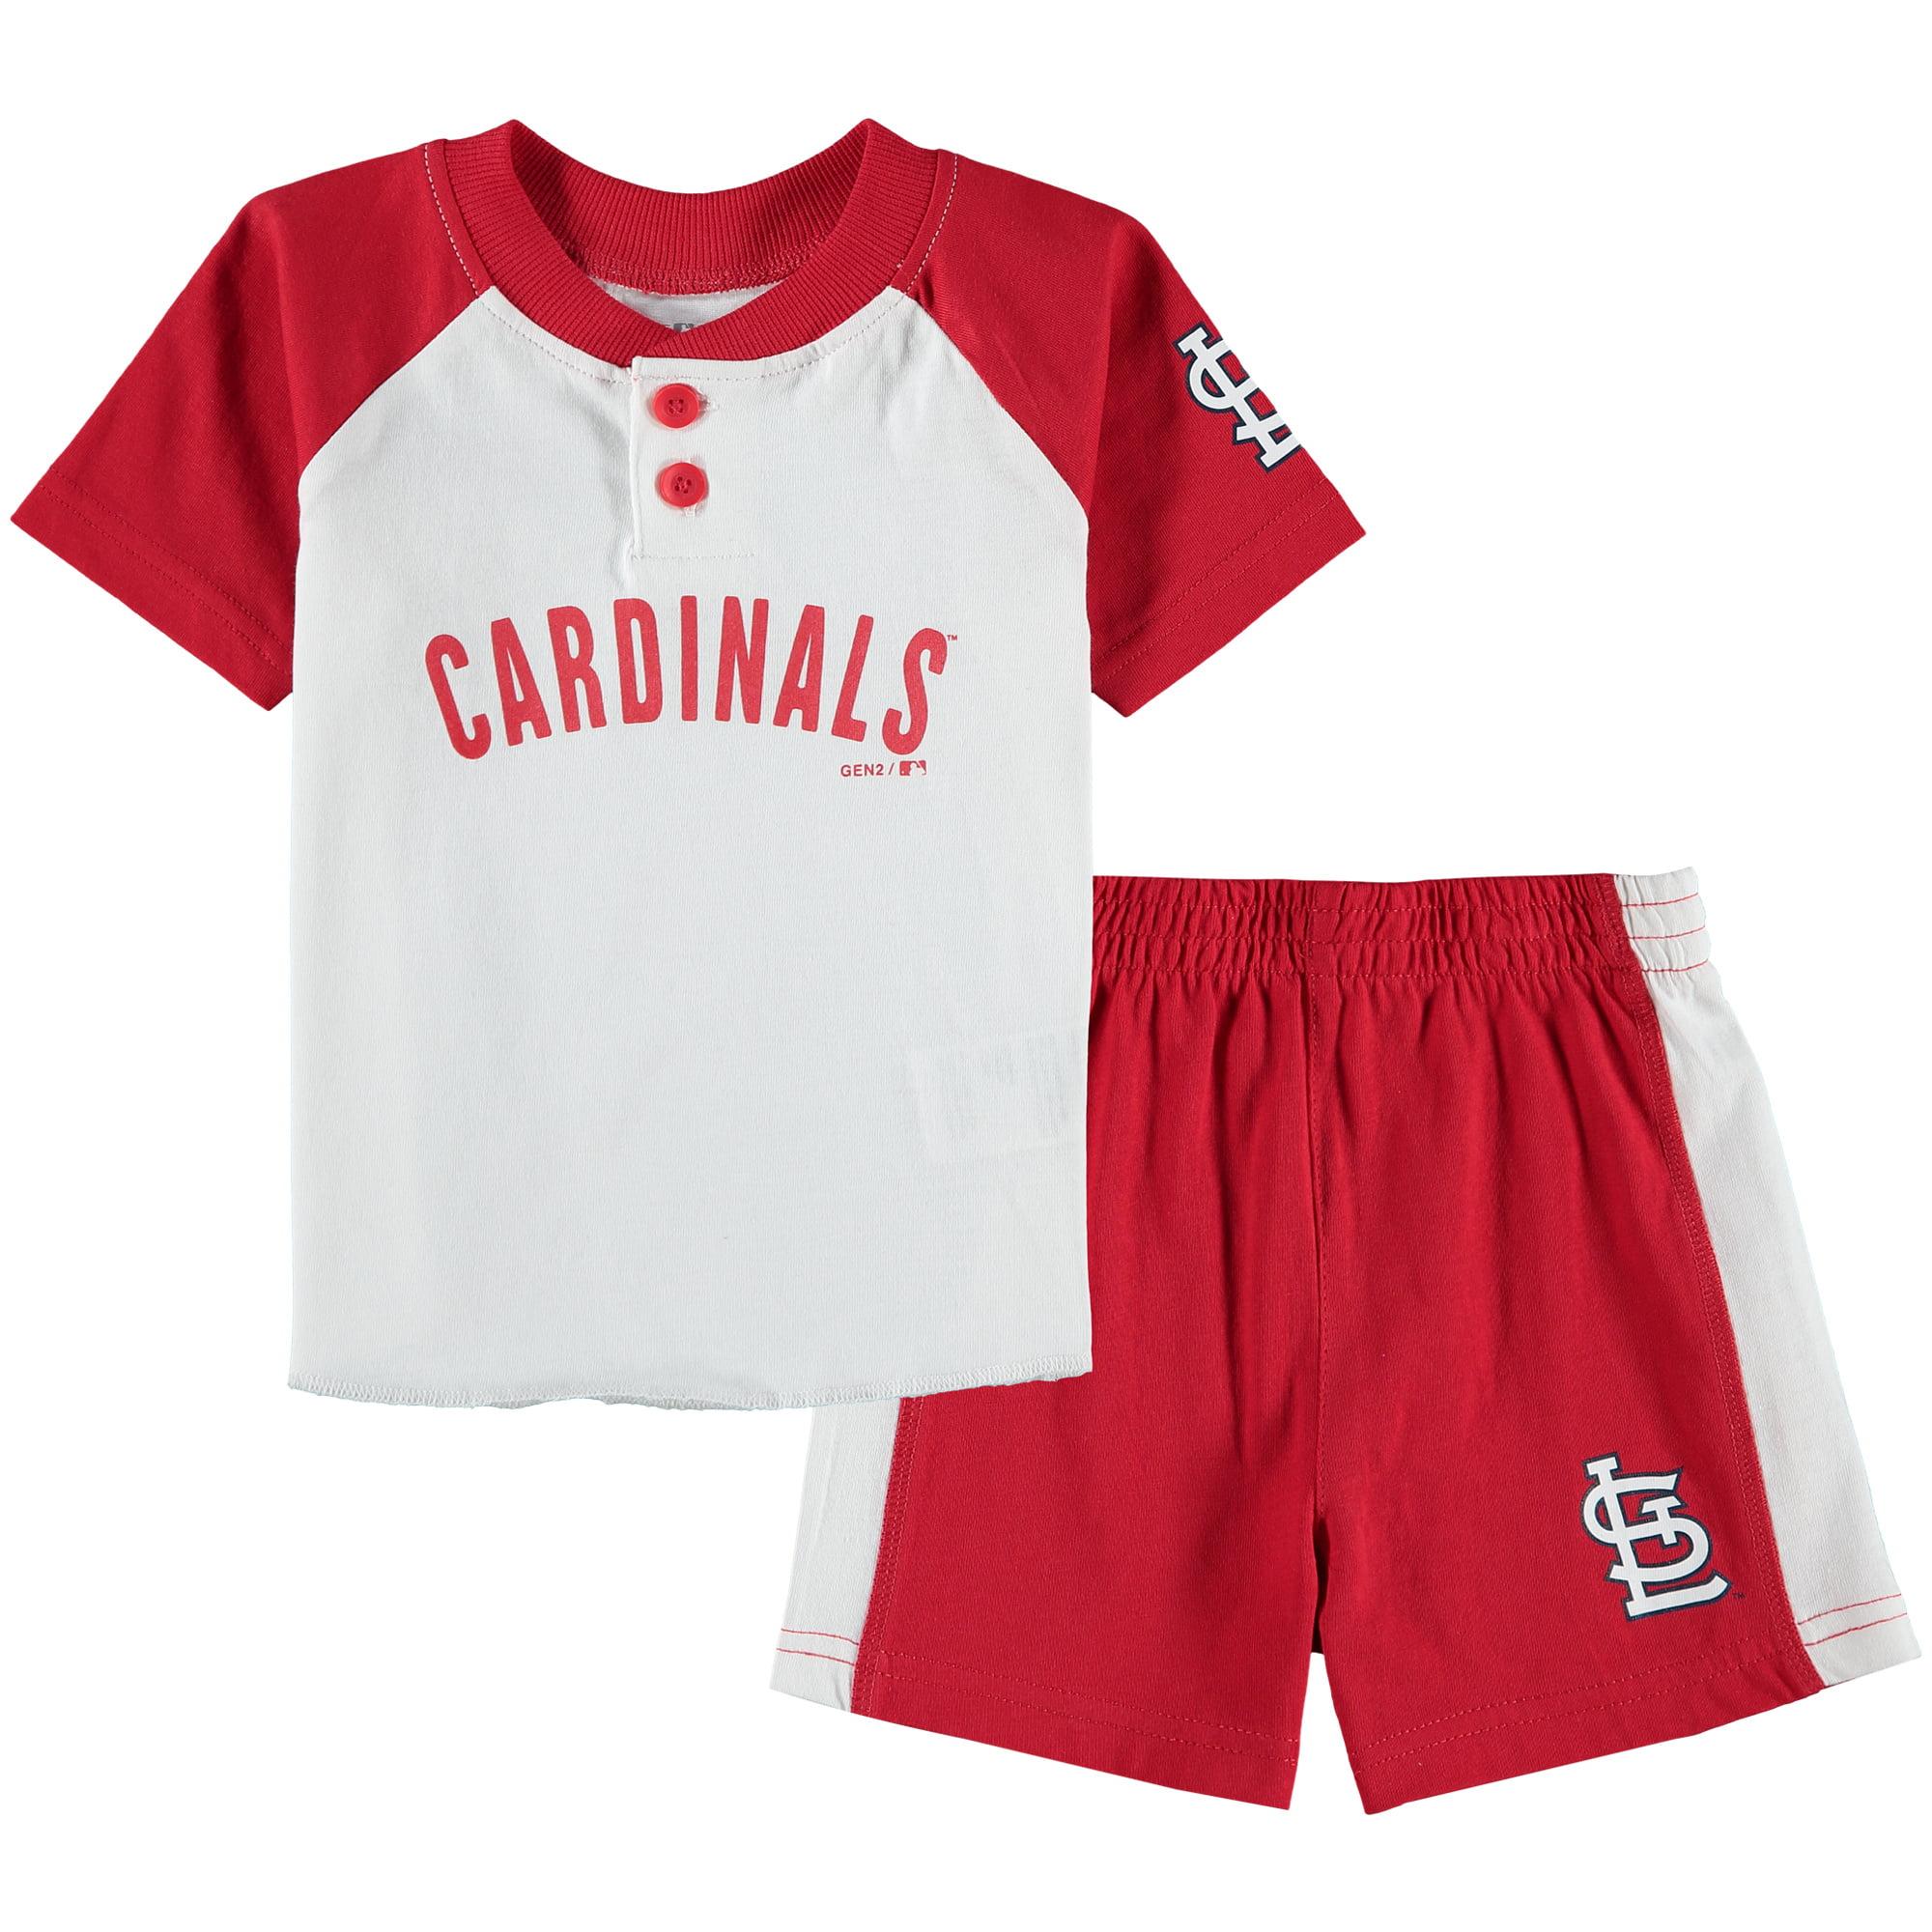 St. Louis Cardinals Infant Good Hit Henley T-shirt & Shorts Set - White/Red